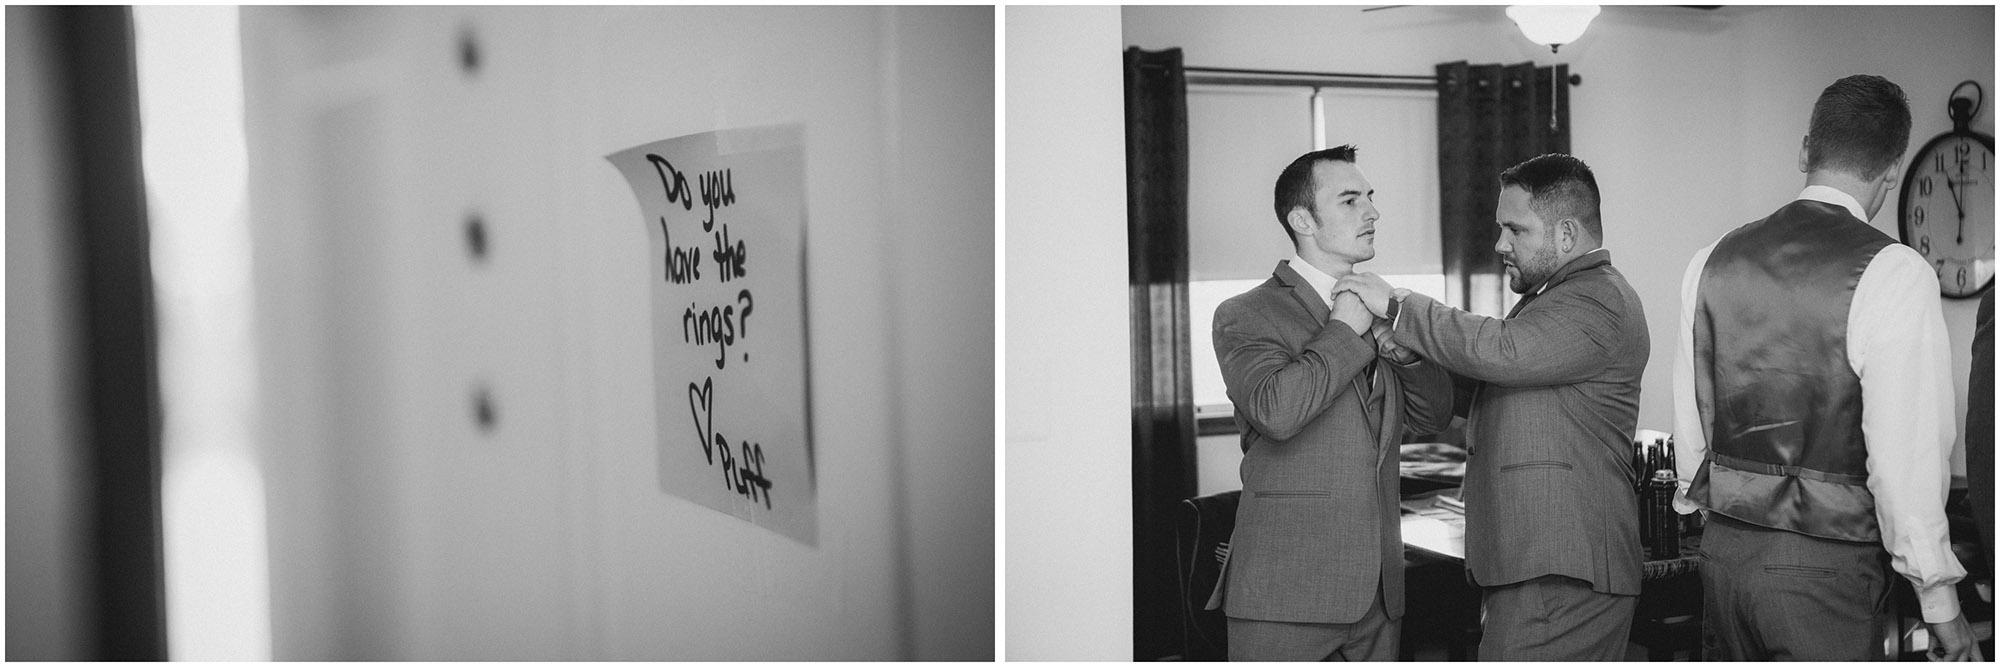 Mike & Danielle's Scranton Wedding Photography 05